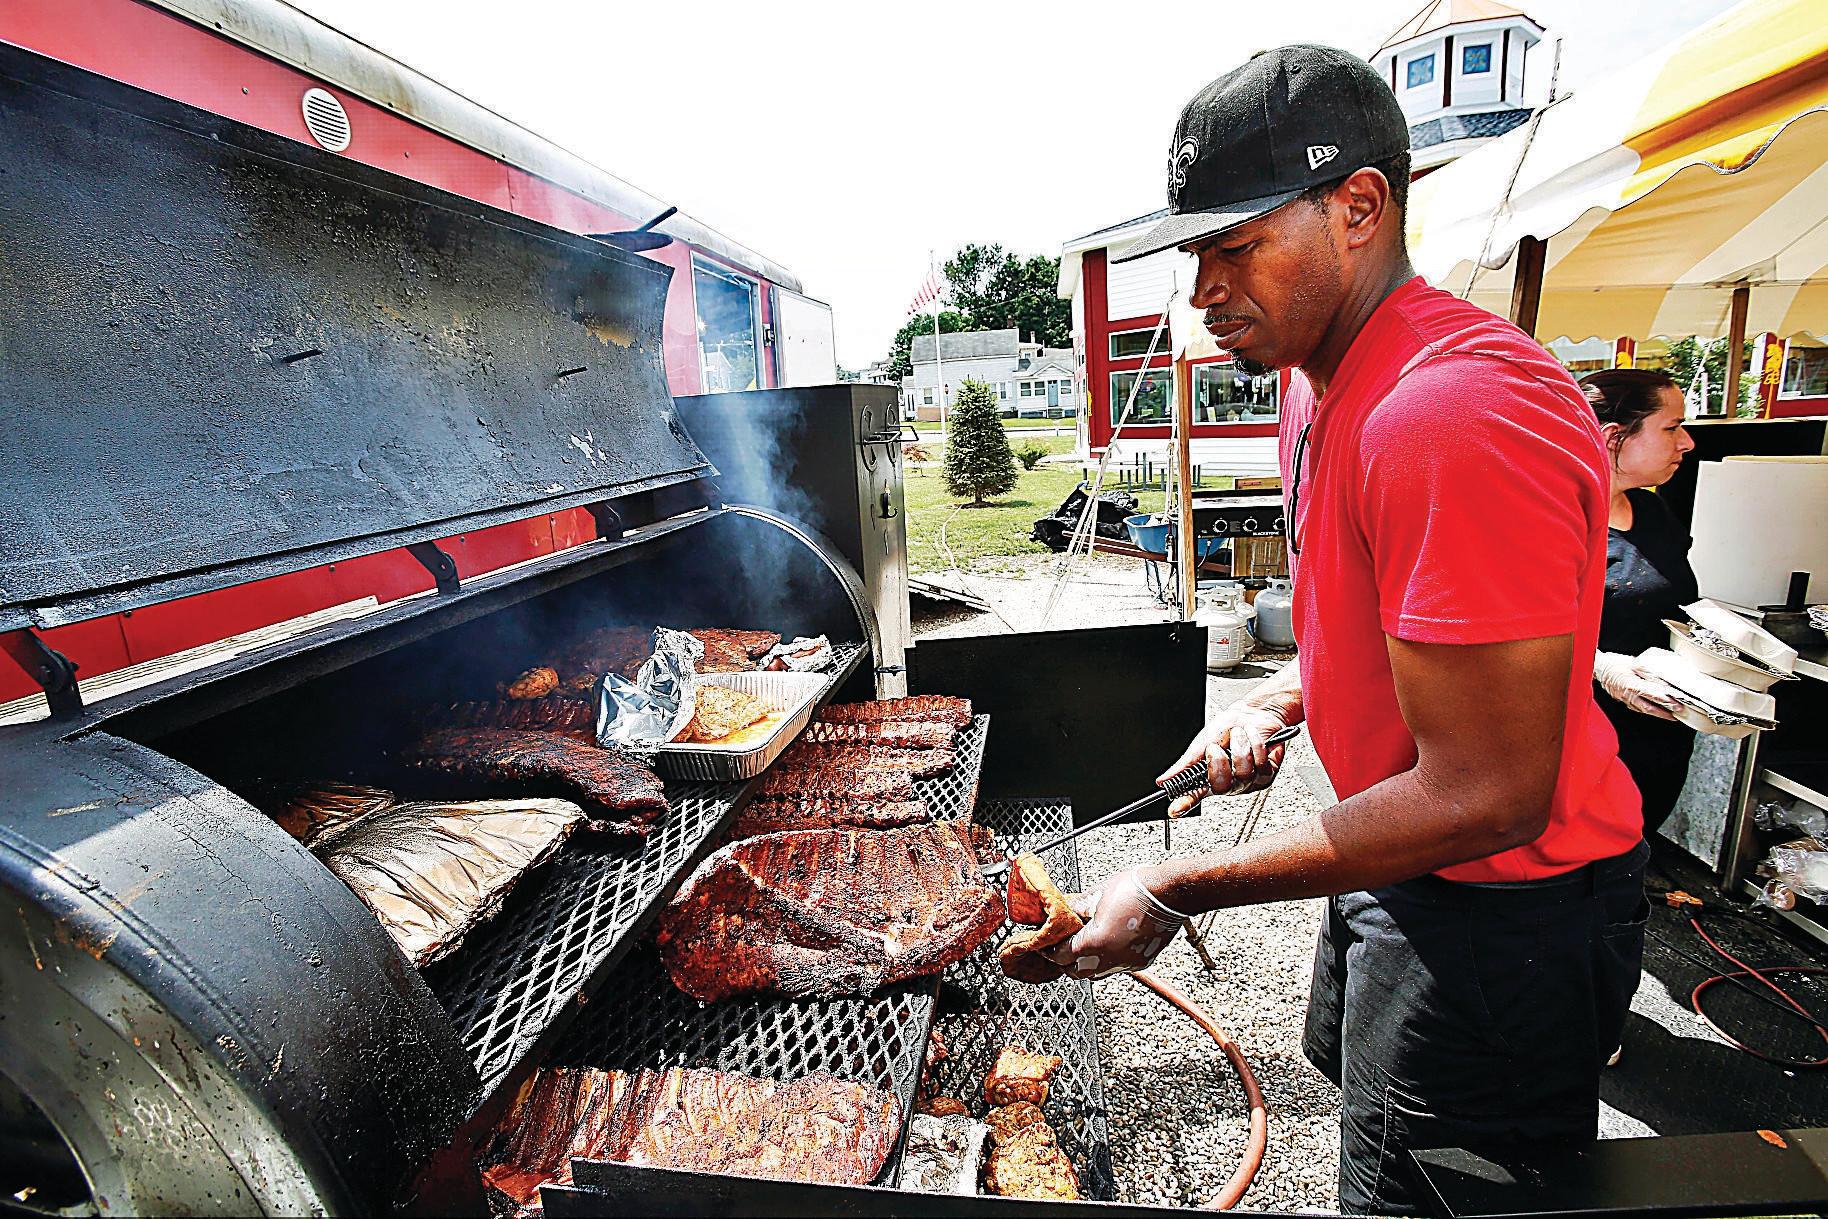 Bubba'S Backyard Bbq  Backyard BBQ Smokin good eats at the Berkshire Carousel